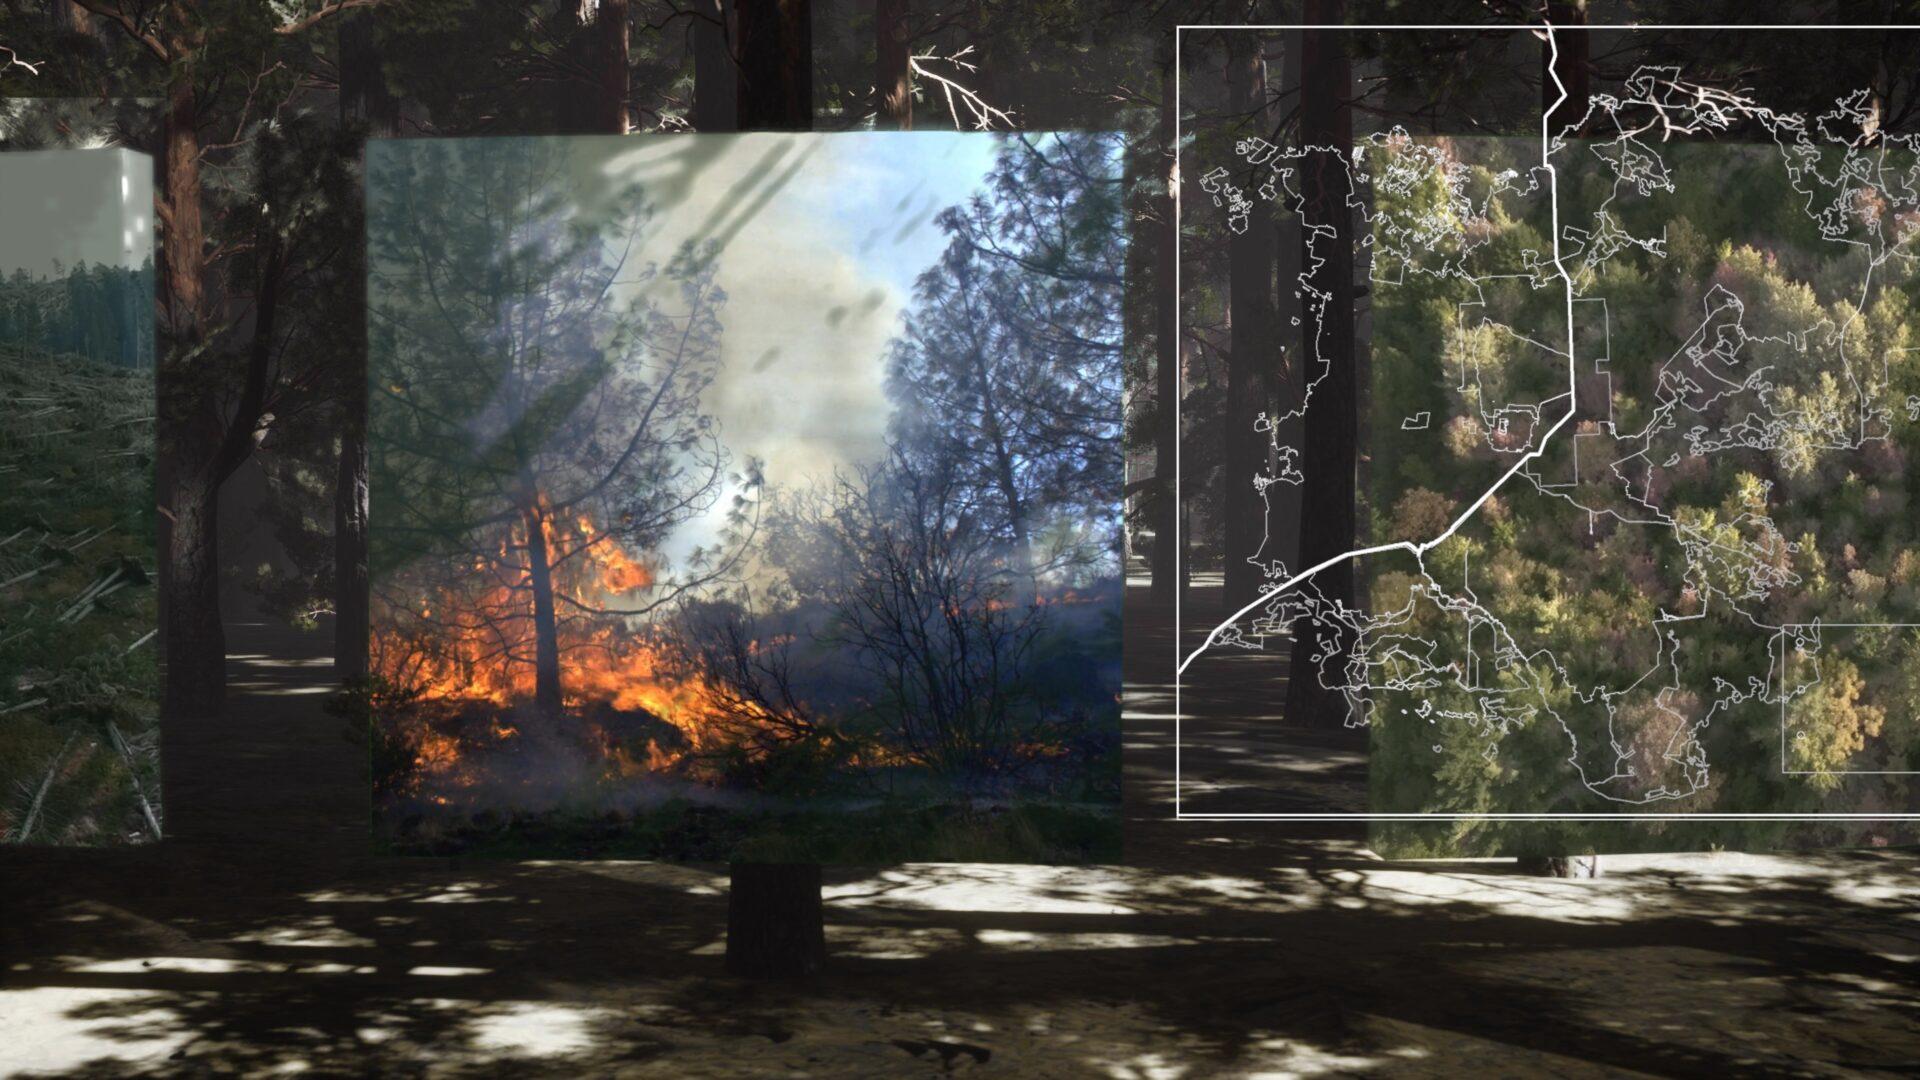 Extended Forest_Tekla Gedeon_08